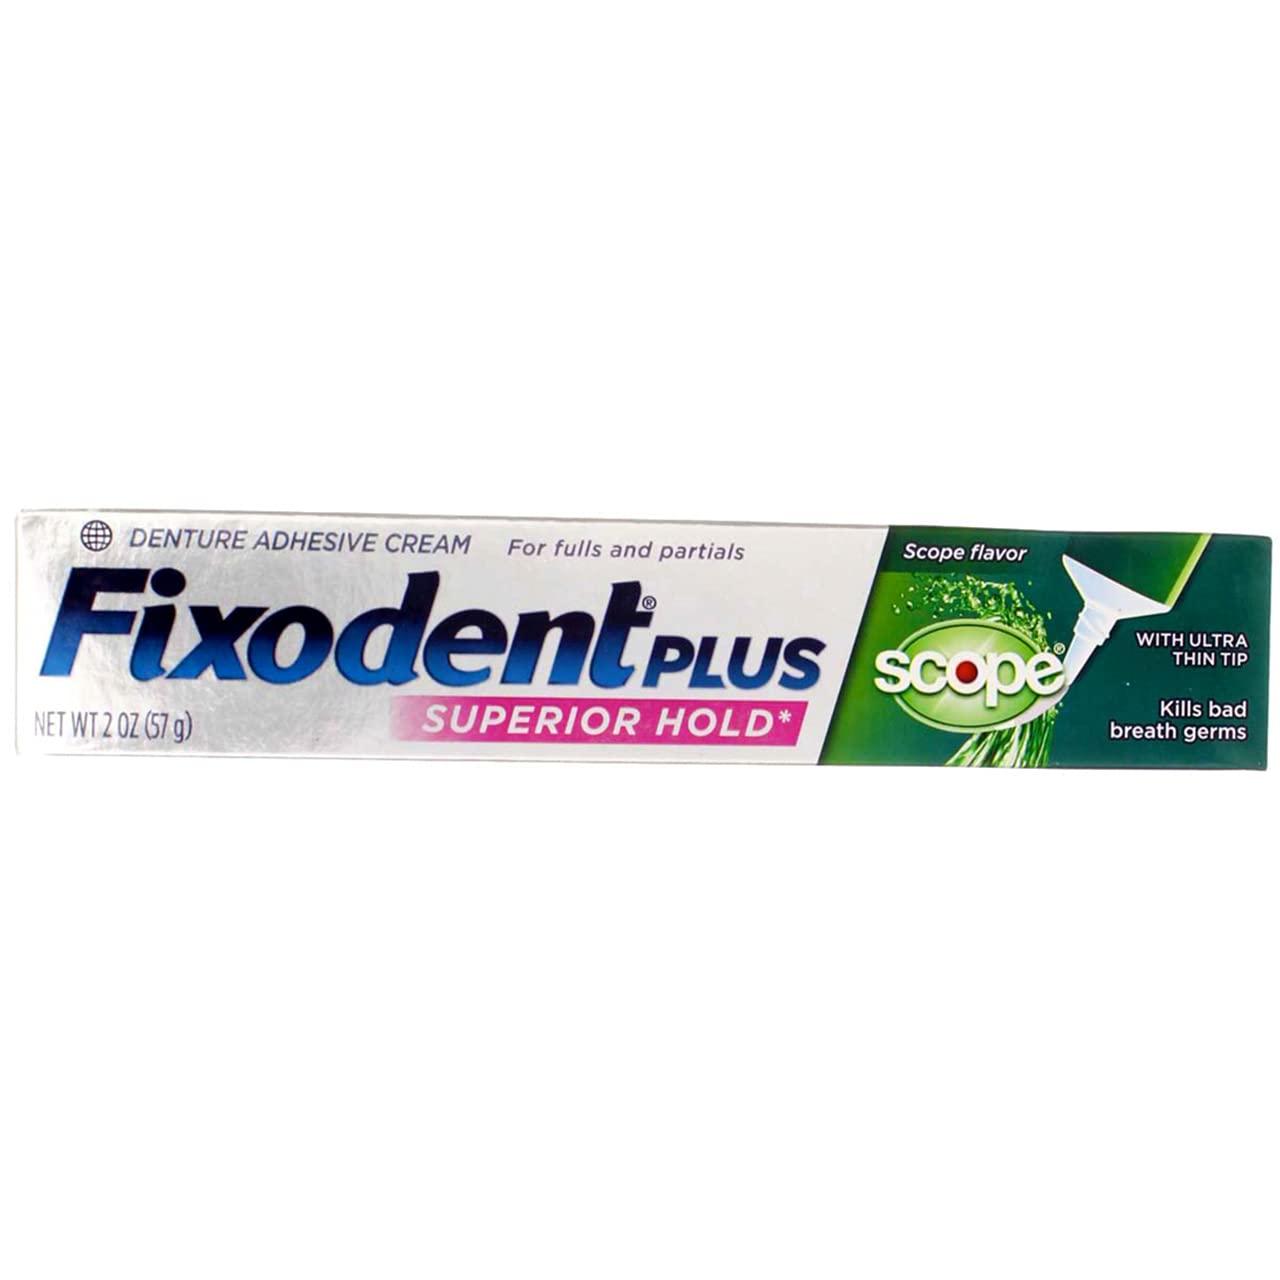 Fixodent Control Denture Adhesive Cream Plus Flavor Scope, 2 Ounce